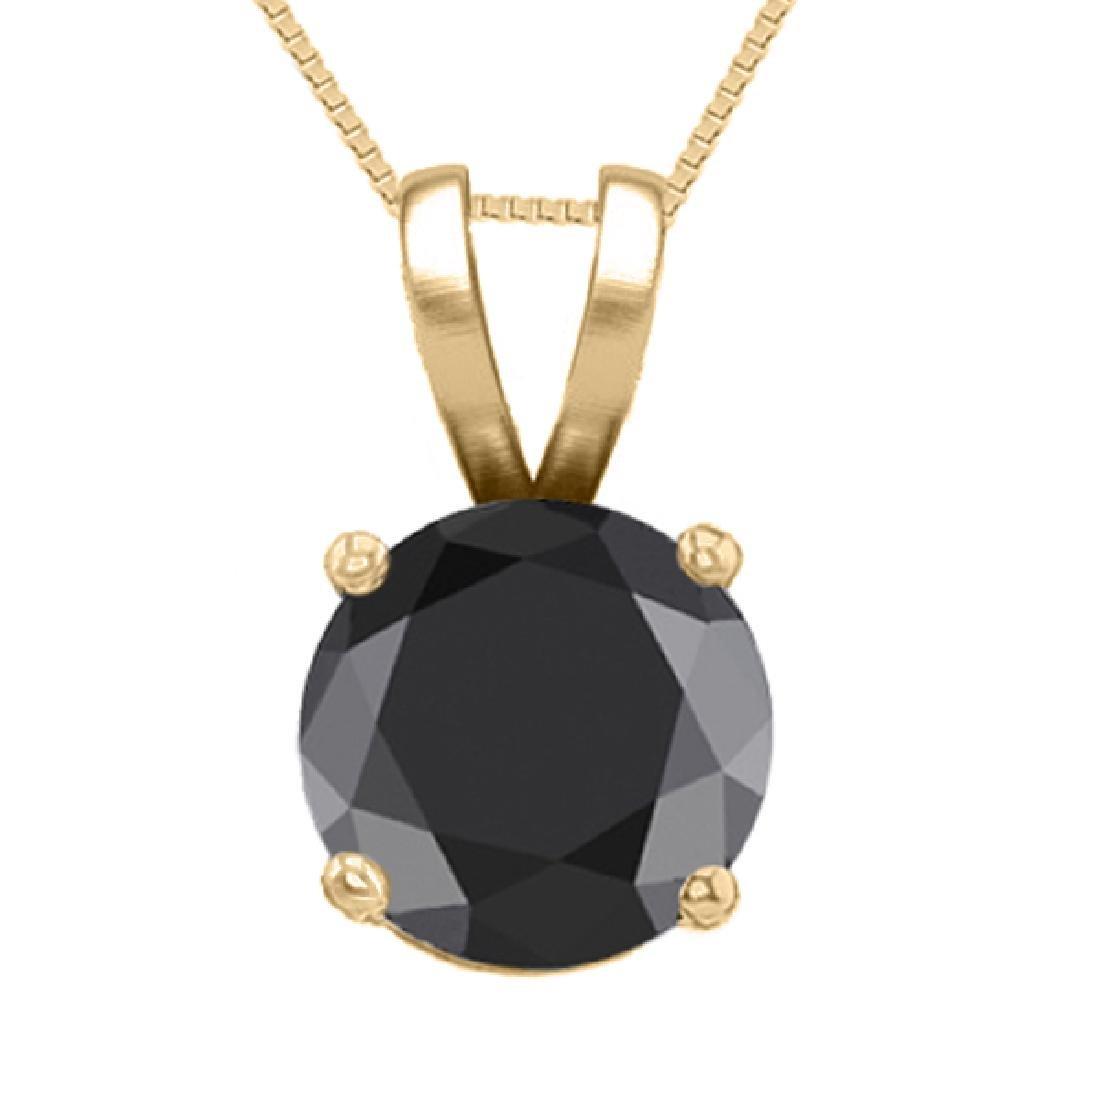 14K Yellow Gold Jewelry 0.52 ct Black Diamond Solitaire